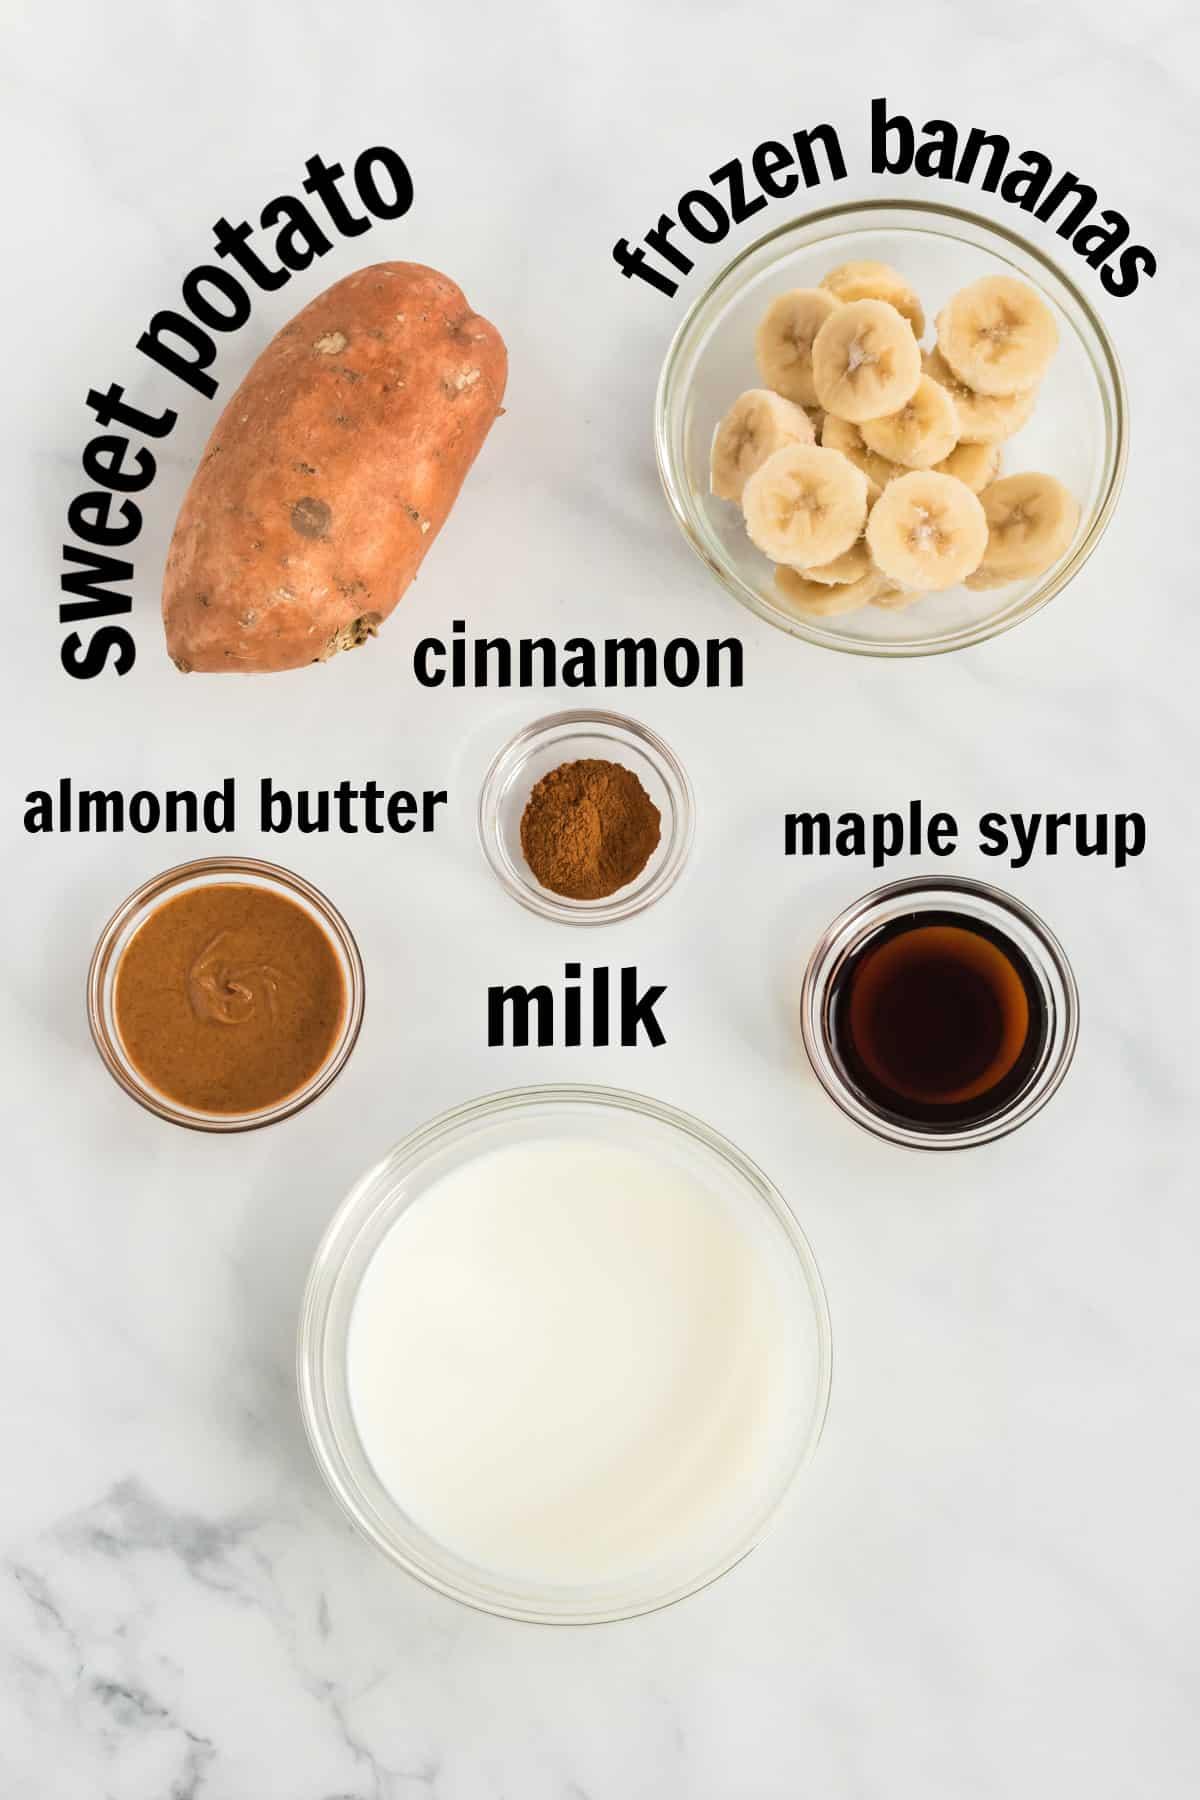 ingredients needed to make a sweet potato smoothie